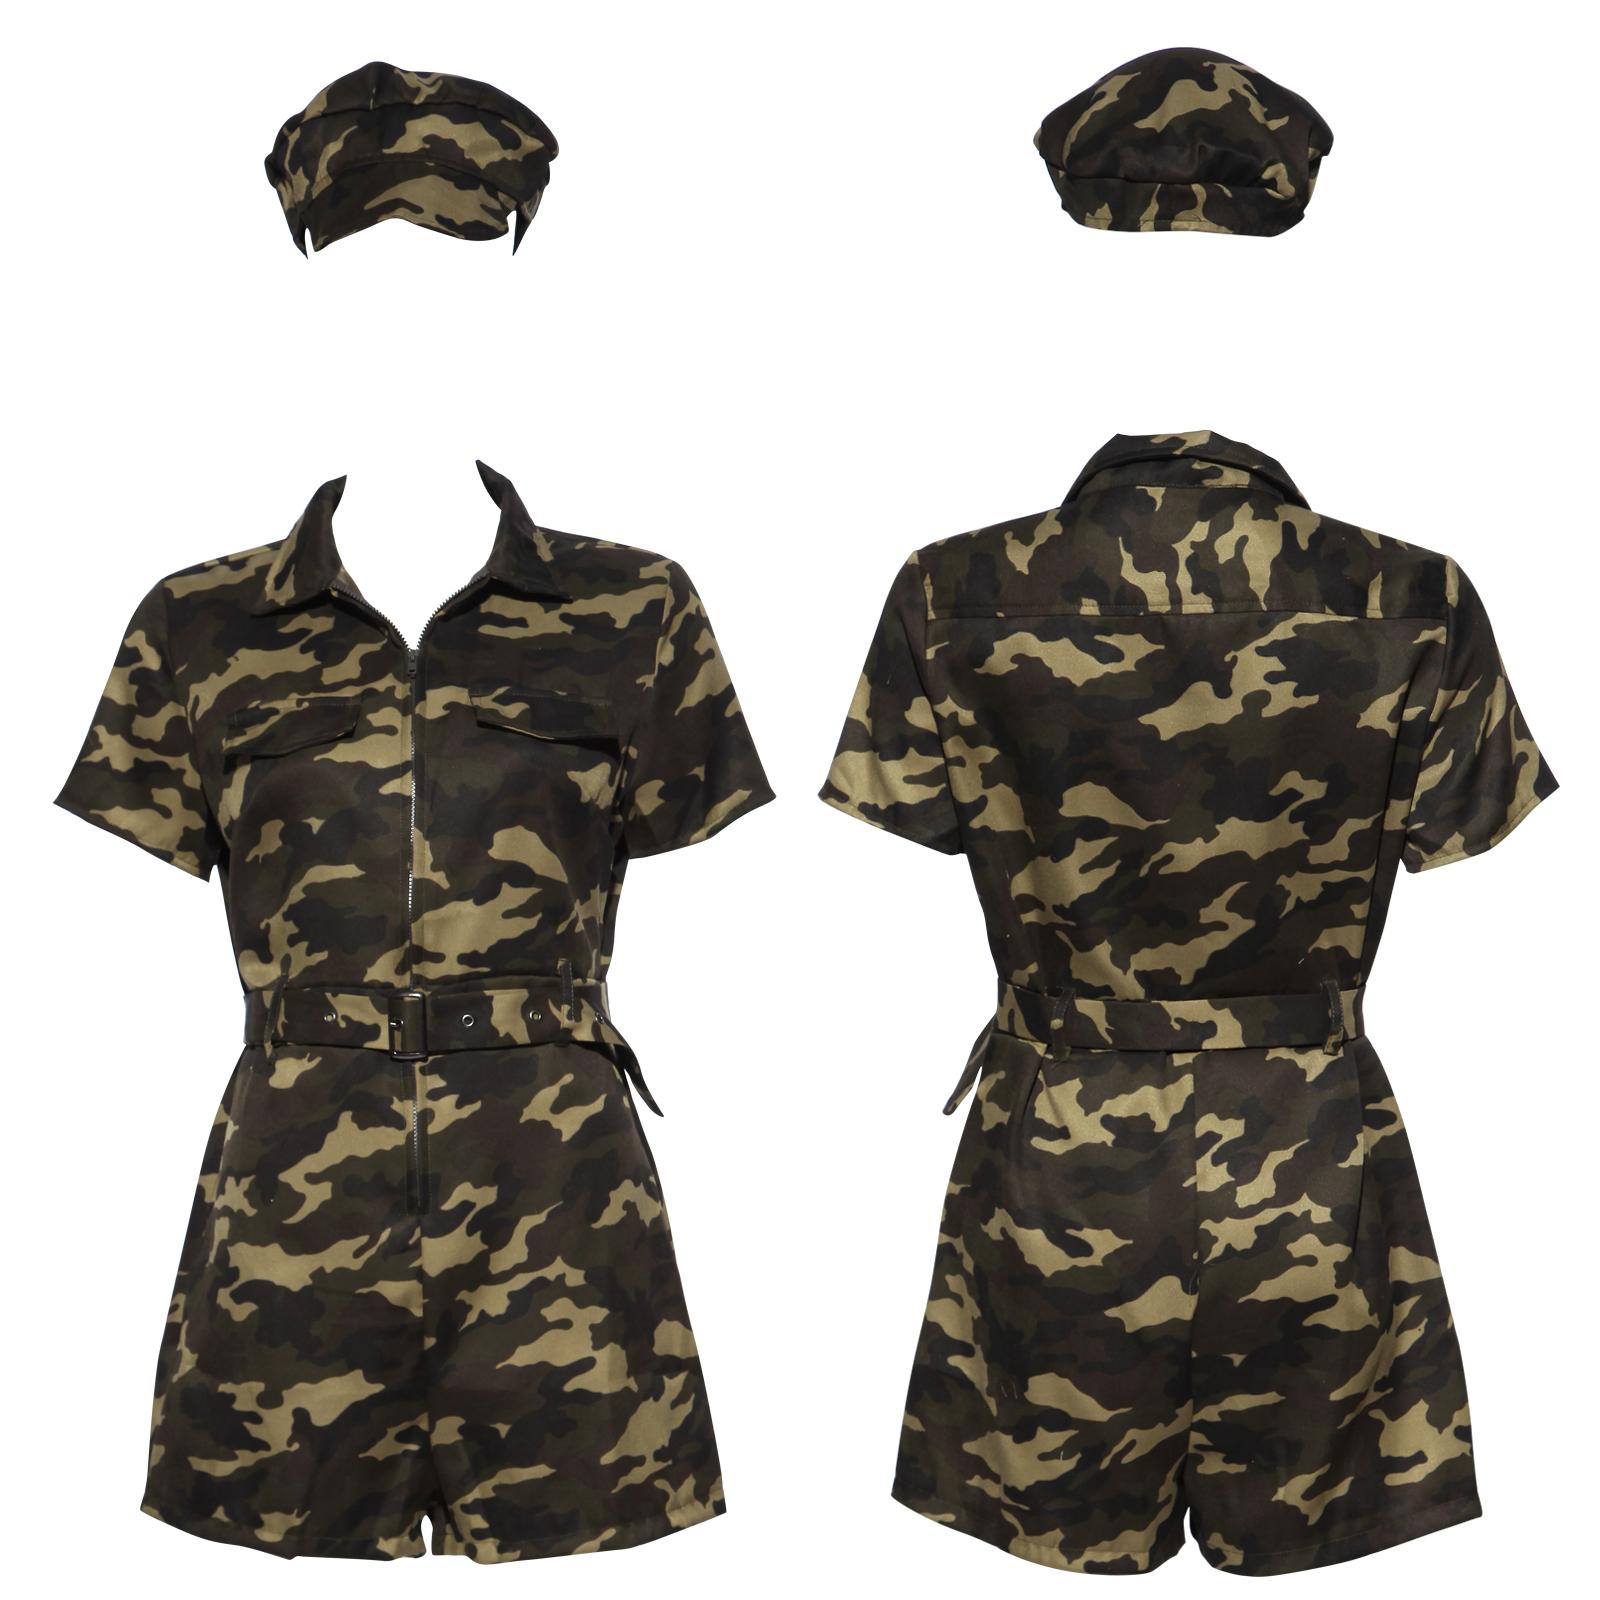 Soldatin Tarnmuster Militär Armee Army Military Kostüm Damen Uniform